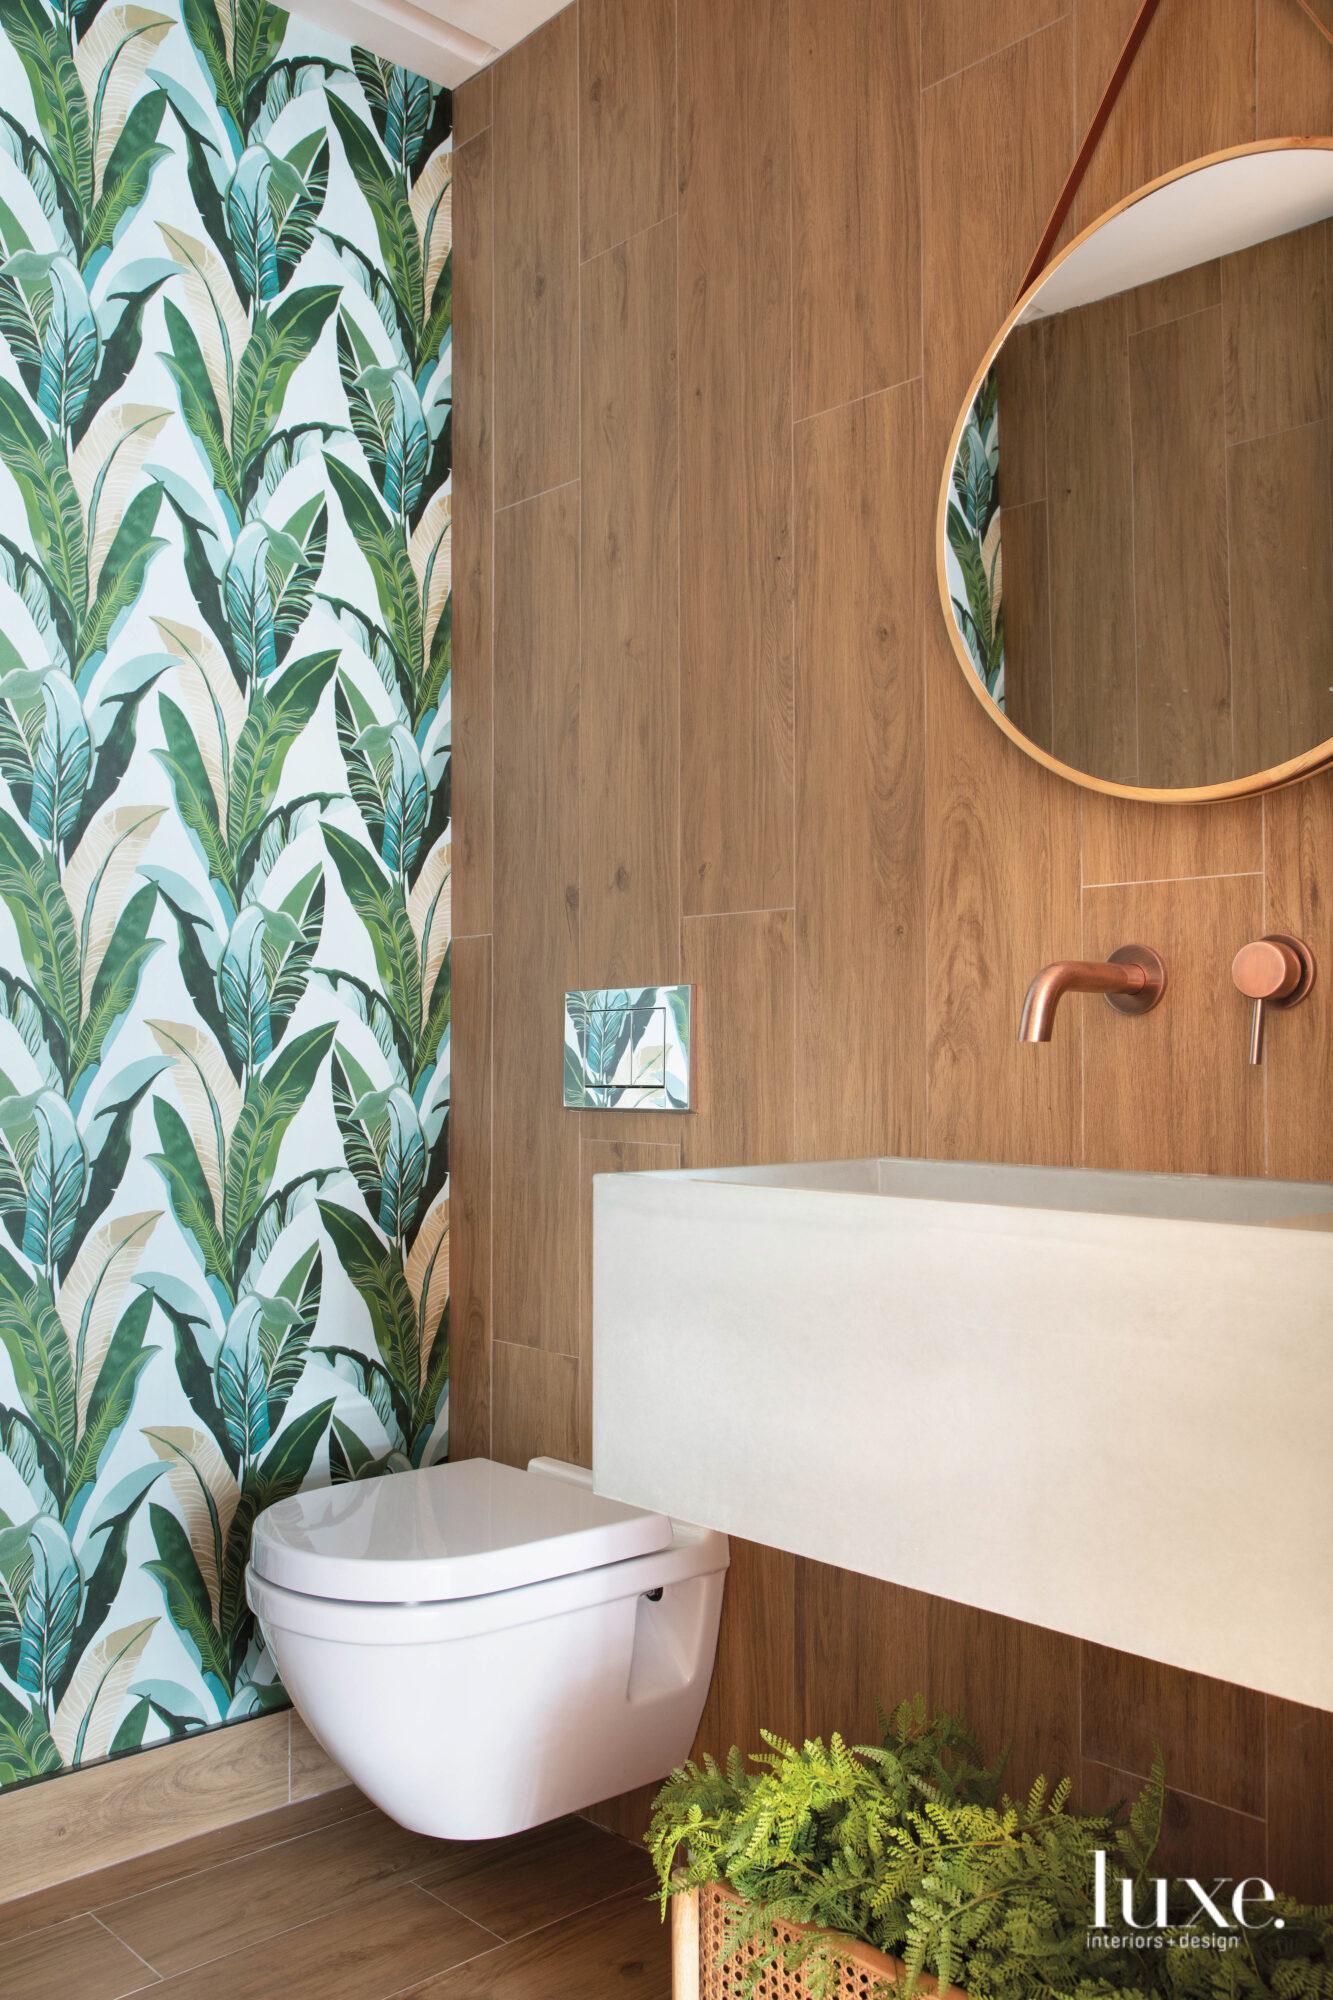 bathroom with banana leaf-print wallpaper